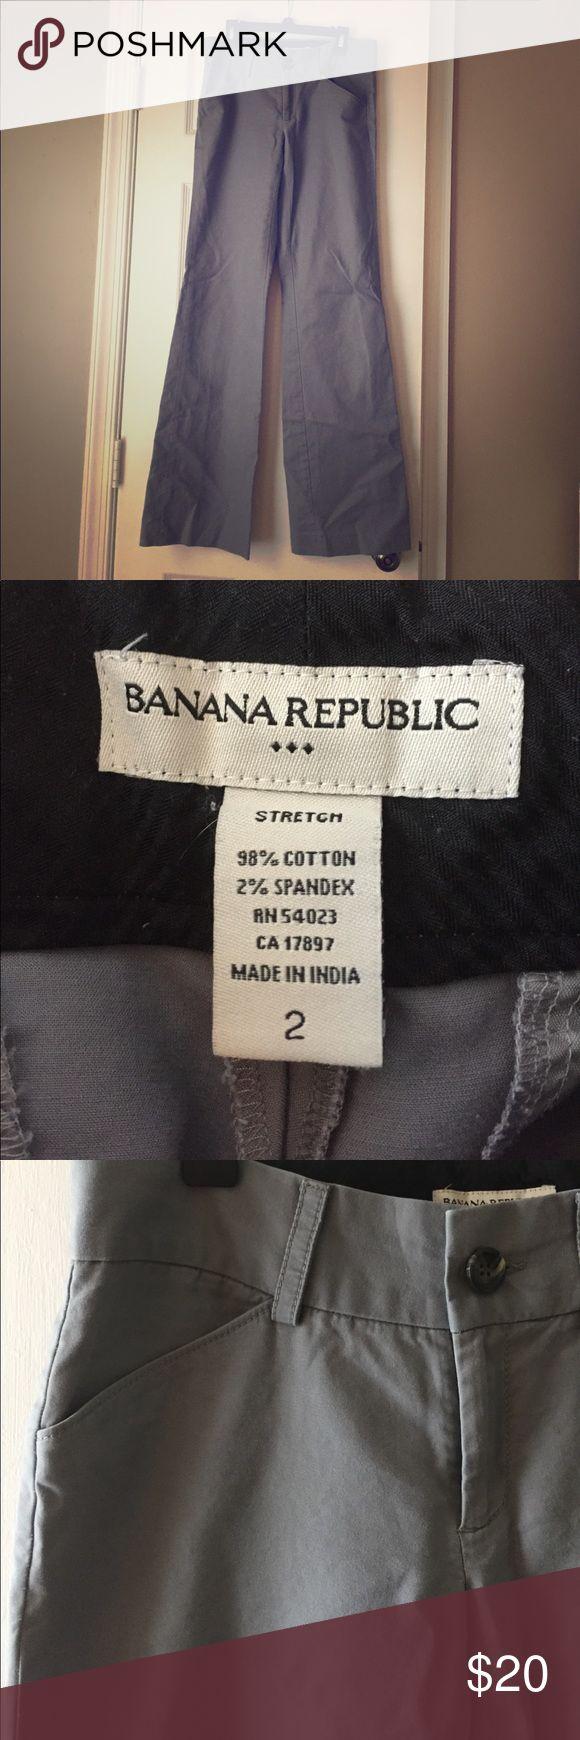 Women's Banana Republic Wide-Leg Trousers Medium gray wide-leg stretch trousers. Like-new condition. Banana Republic Pants Trousers